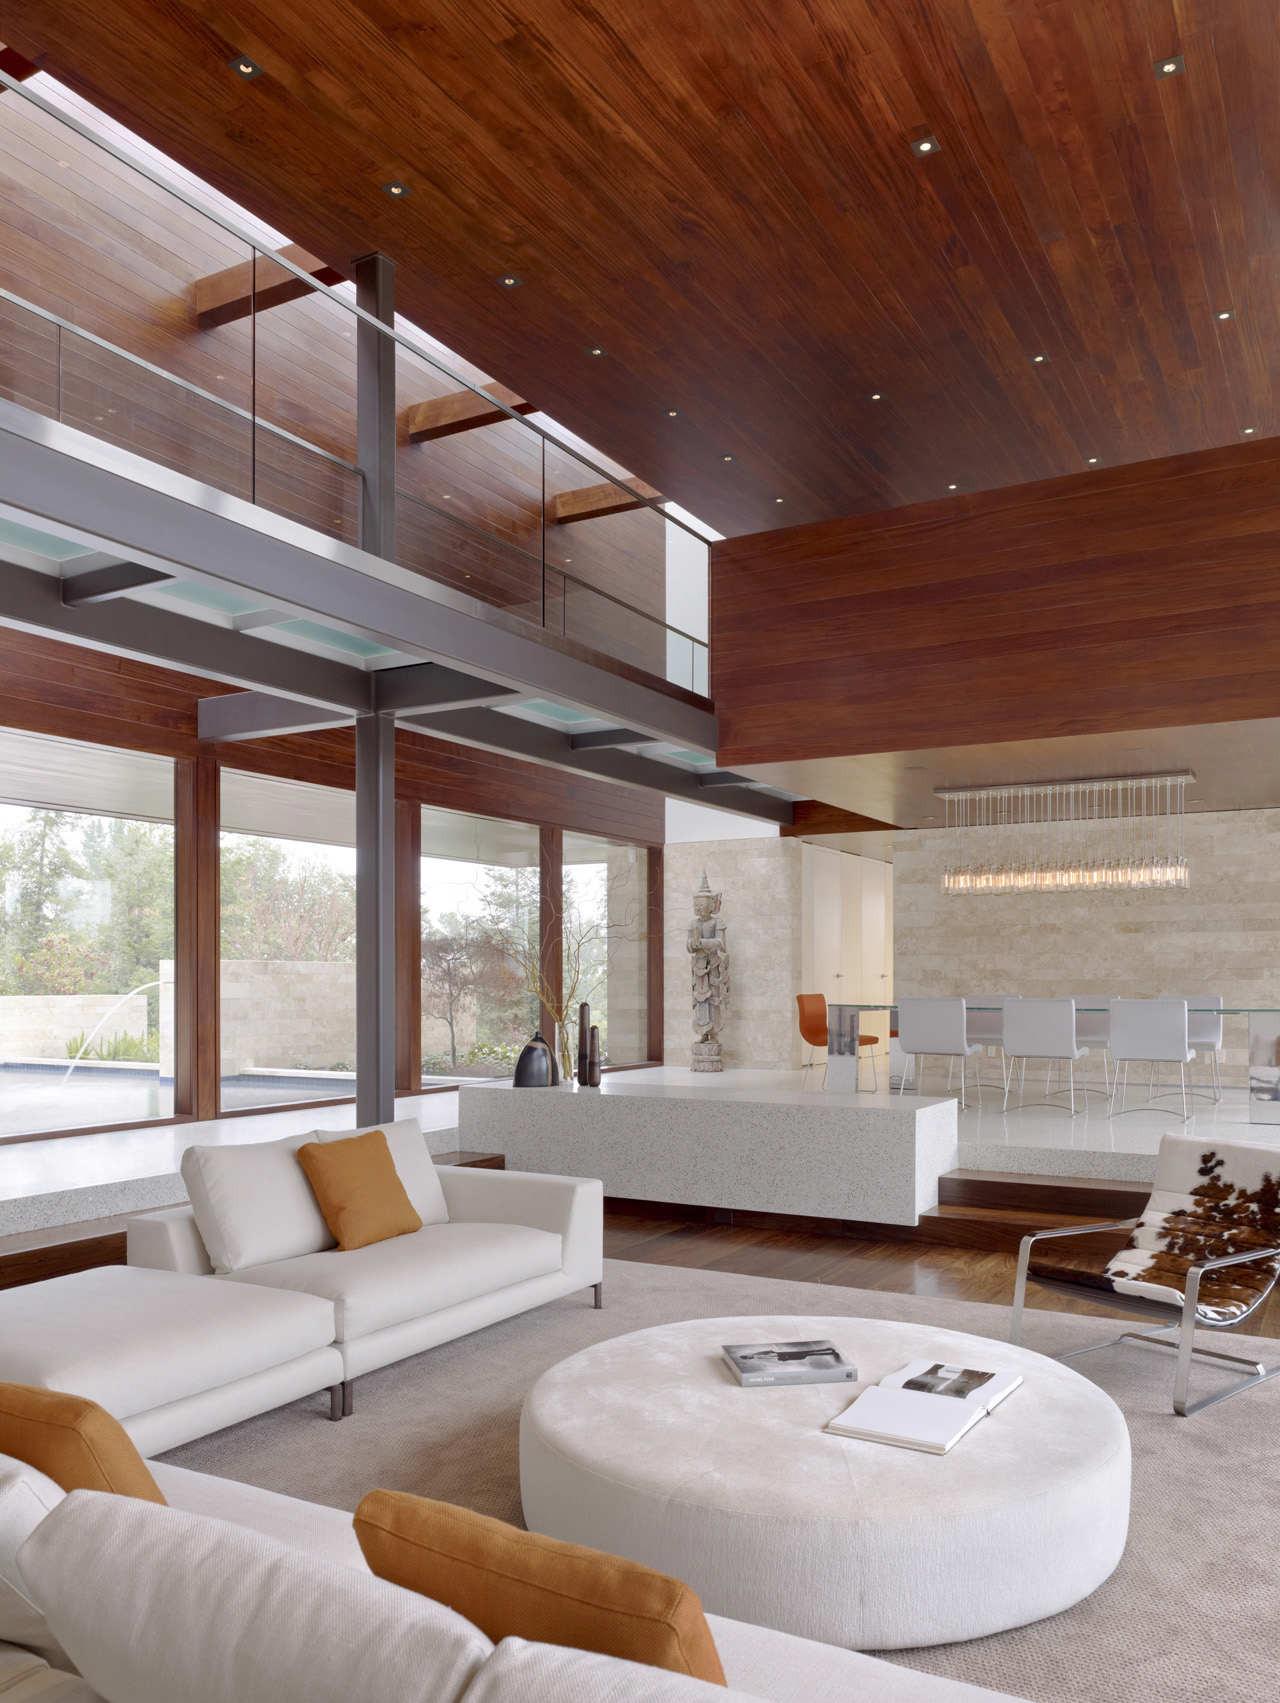 oz living furniture. Zoom Image | View Original Size Oz Living Furniture R